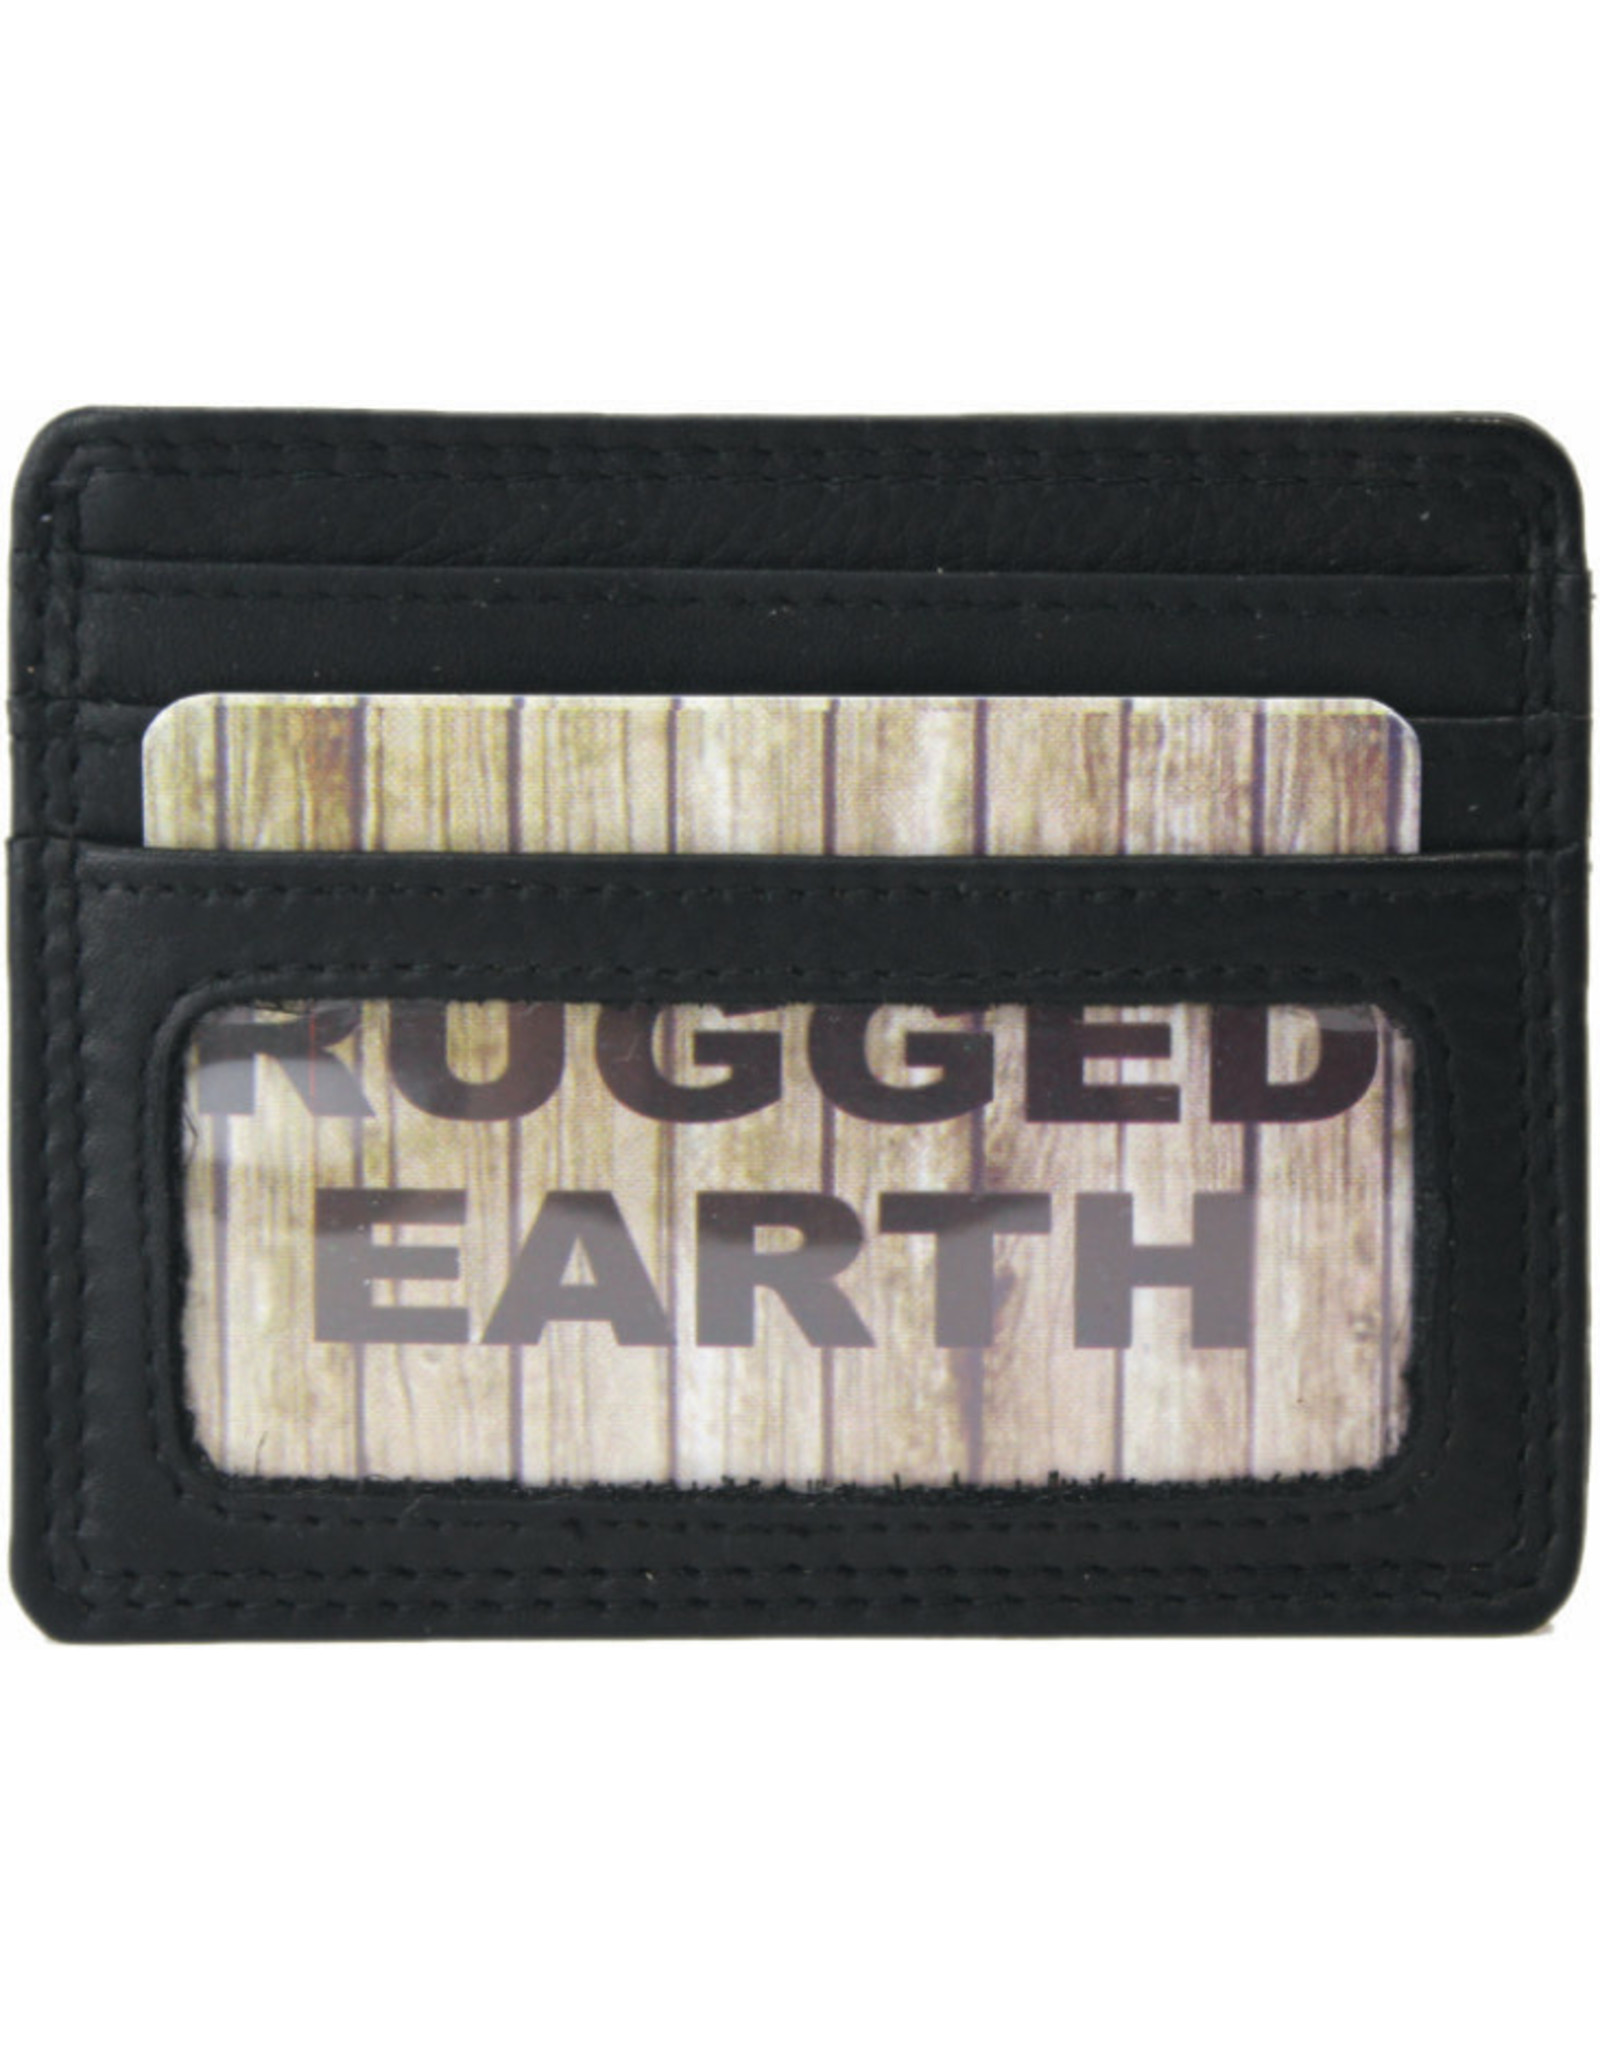 "Rugged Earth Rugged Earth Porte Carte 880021 Black W 7 3/4""*H 4 1/4""*D 1"""